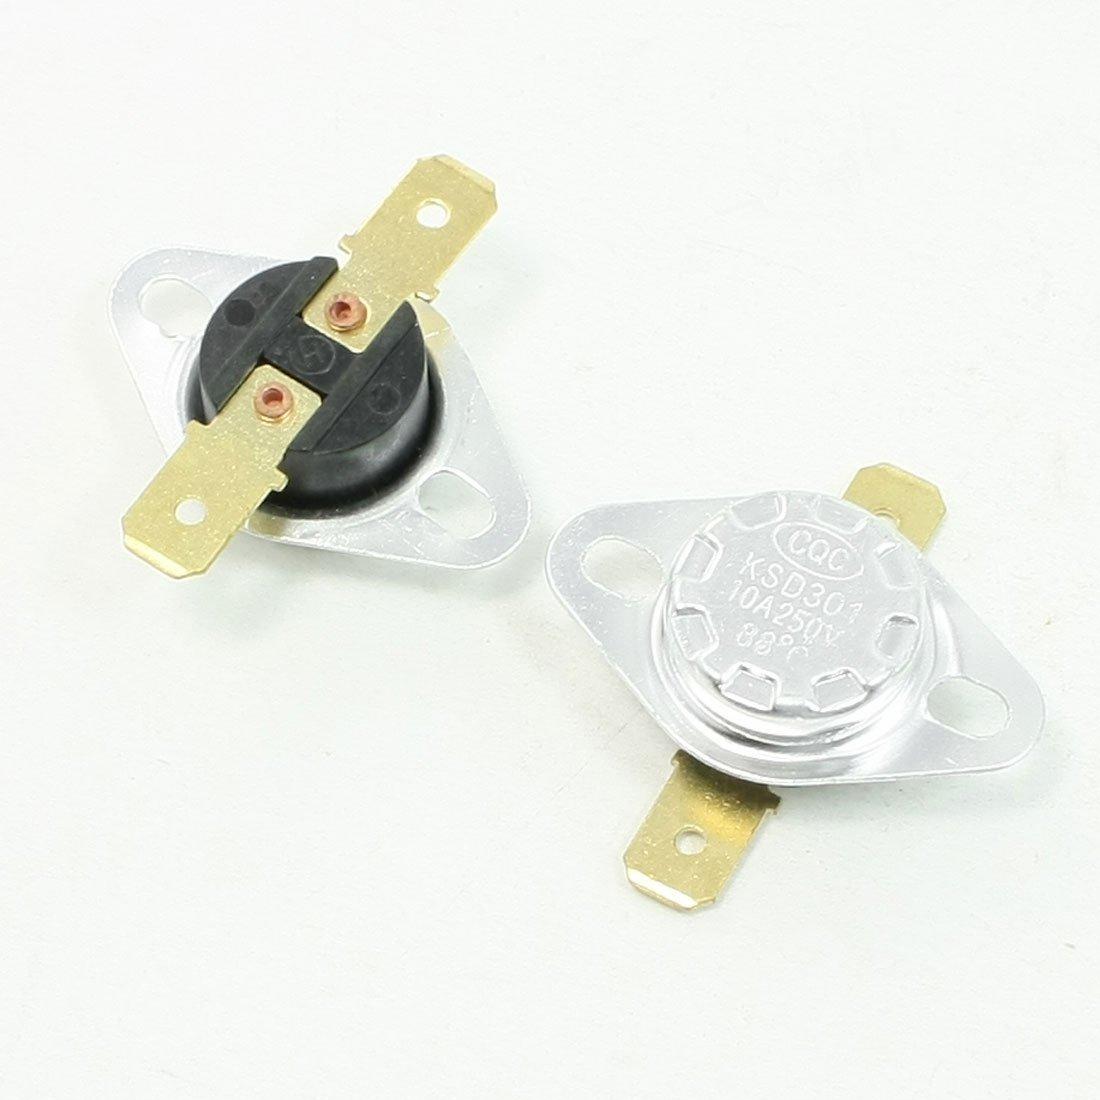 2 Pcs 250V 10A 88 Celsius 190F Temperature Controlled Switch KSD301 Sourcingmap a13070200ux0307